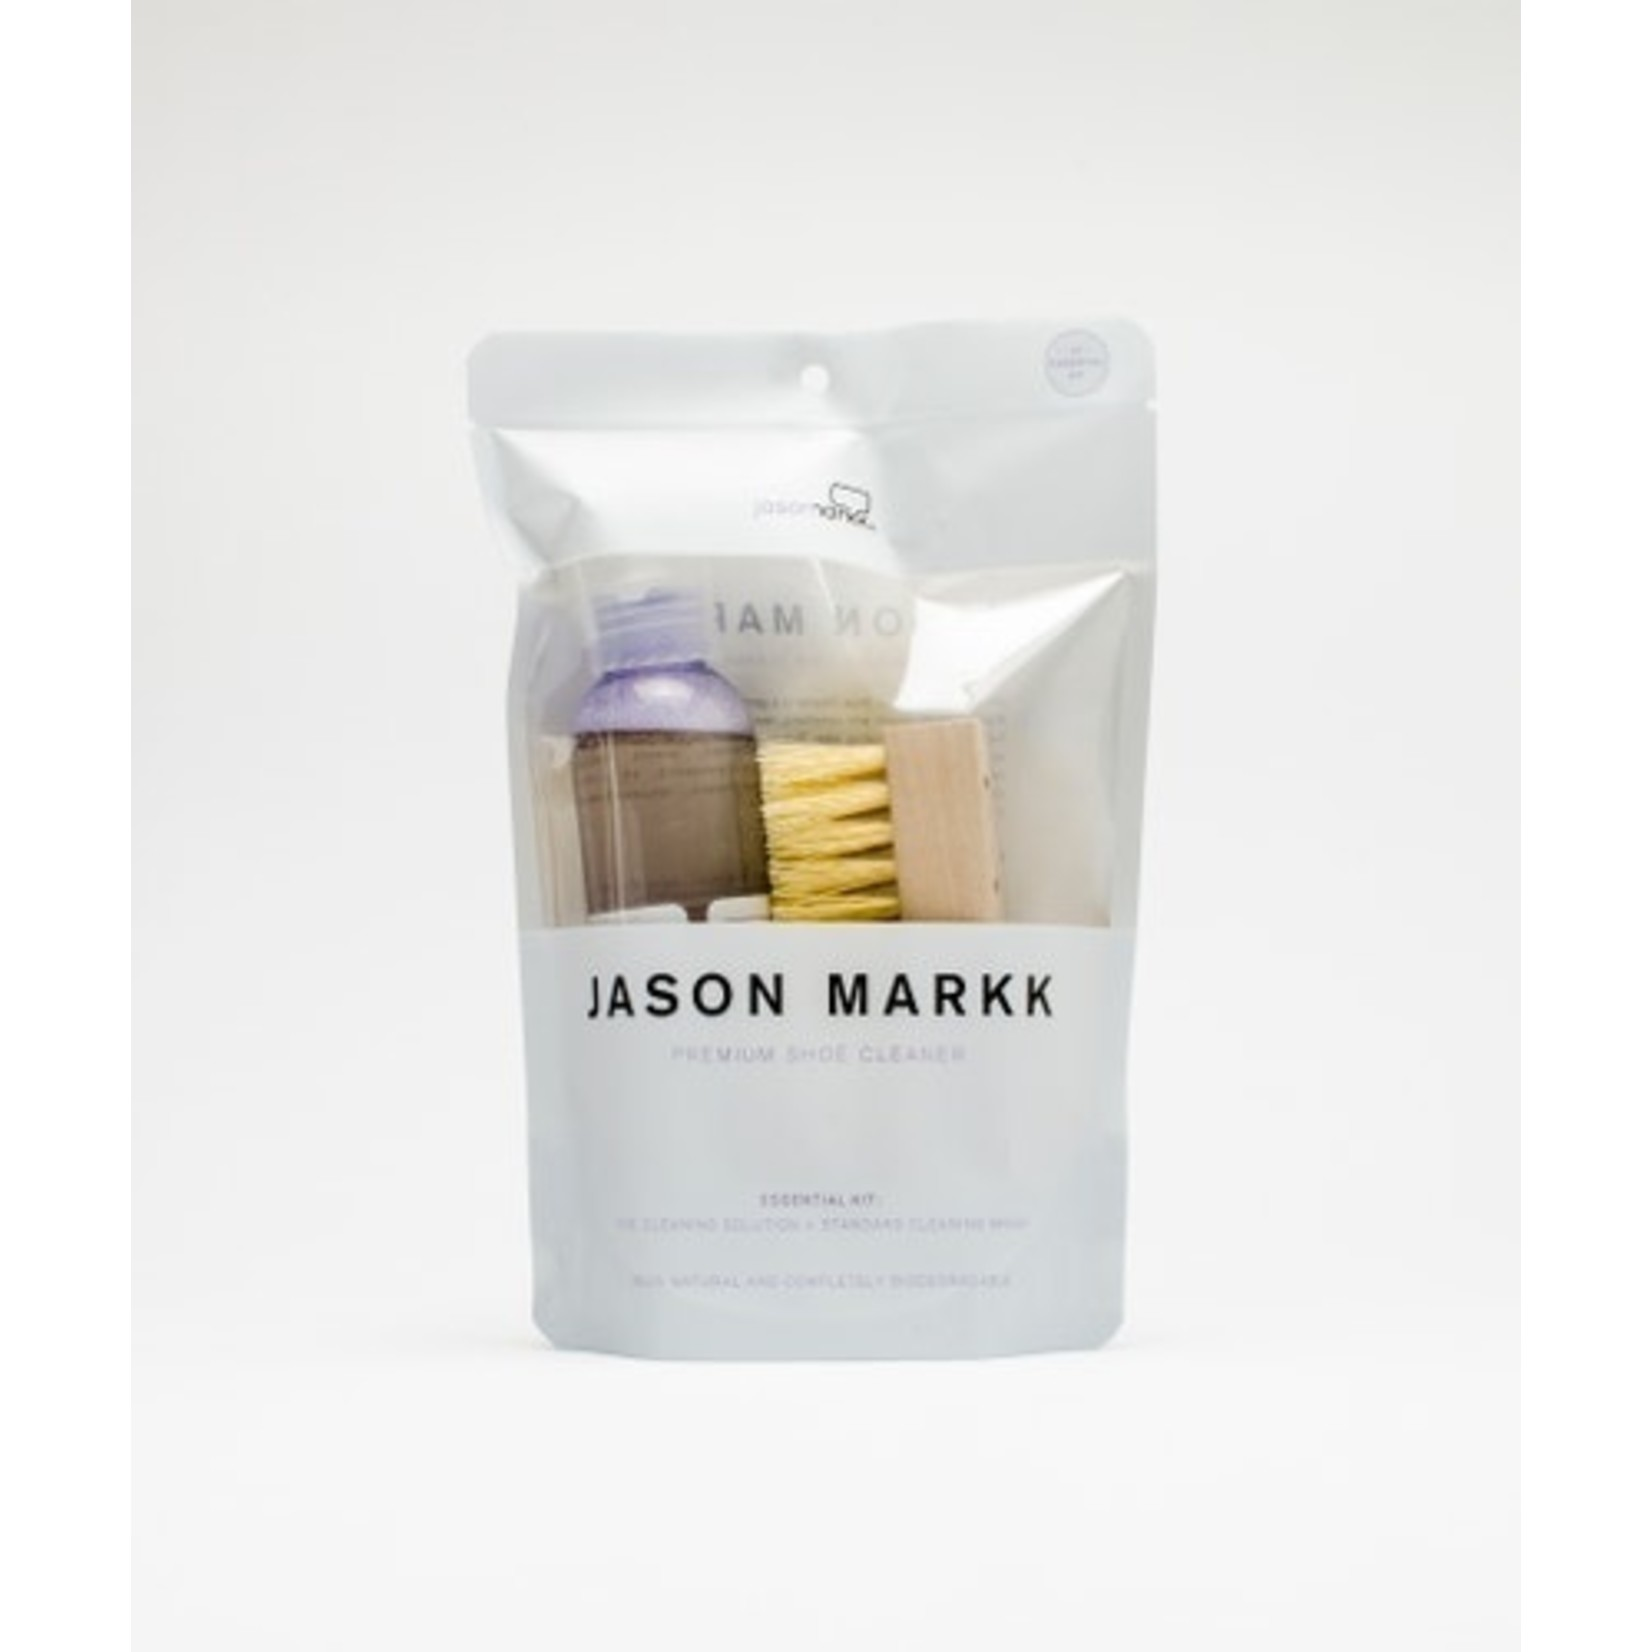 jason mark premium shoe cleaner